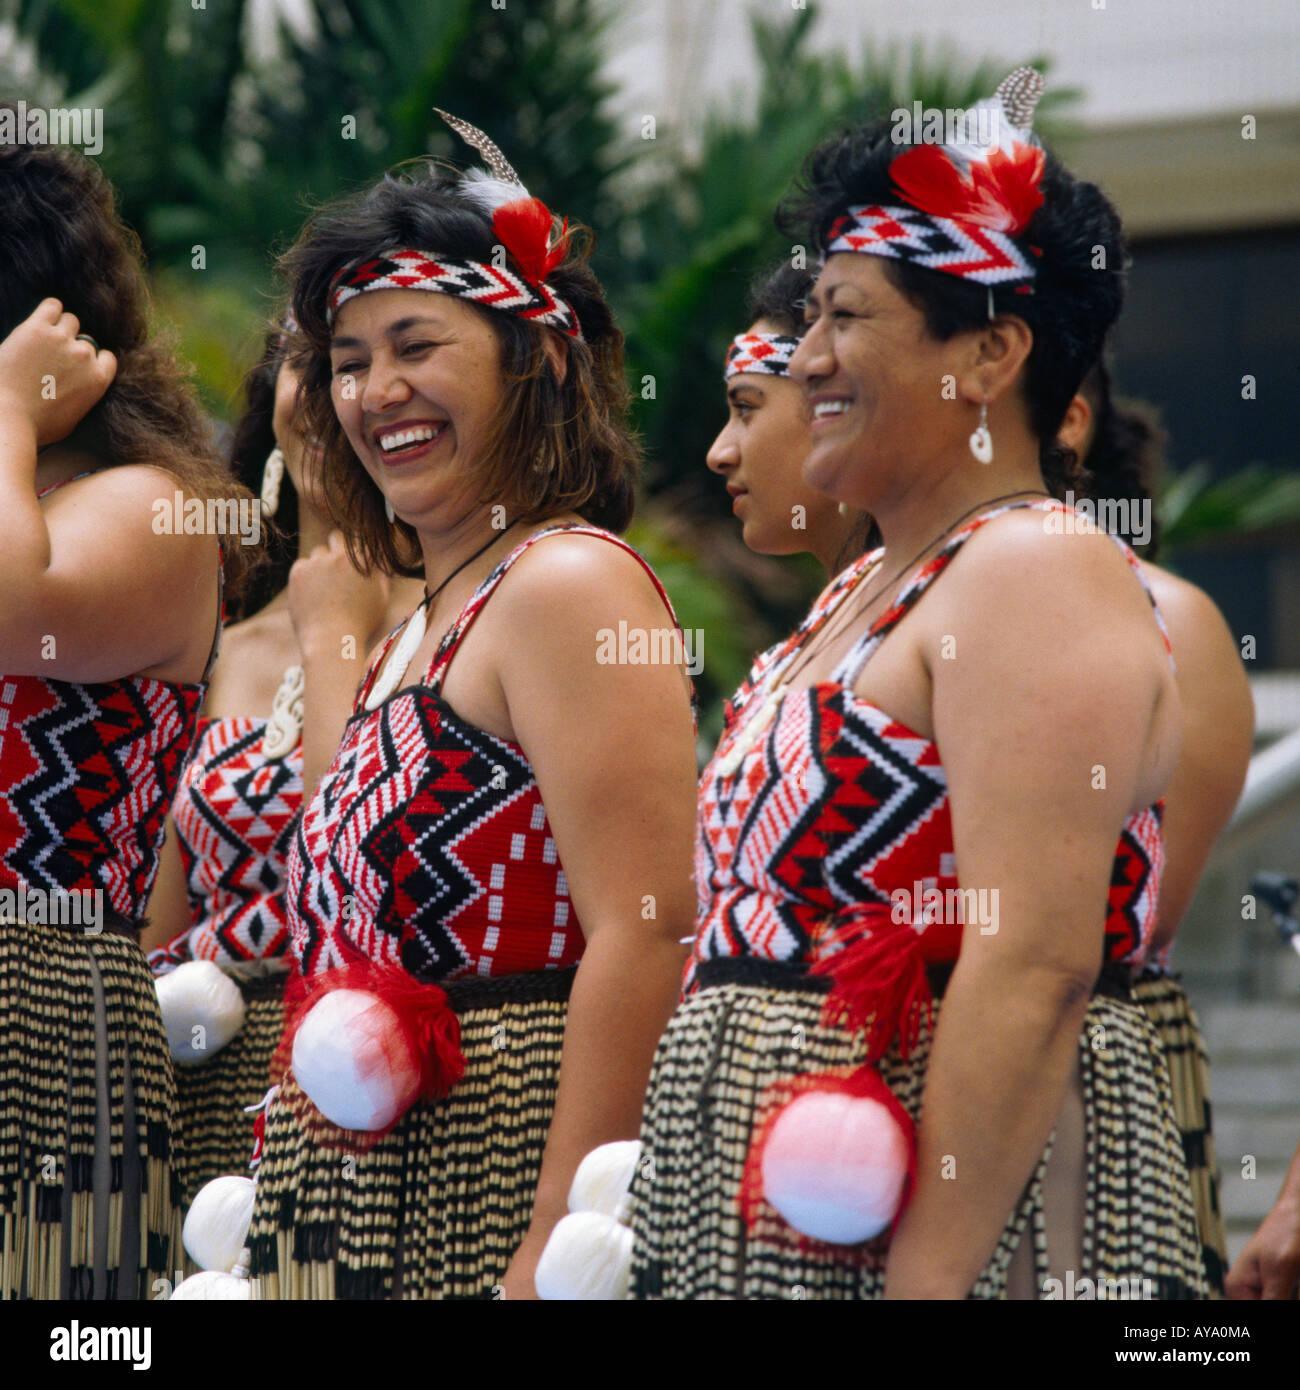 Women In Maori Culture: Female Maori Singers And Dancers In Traditional Dress From